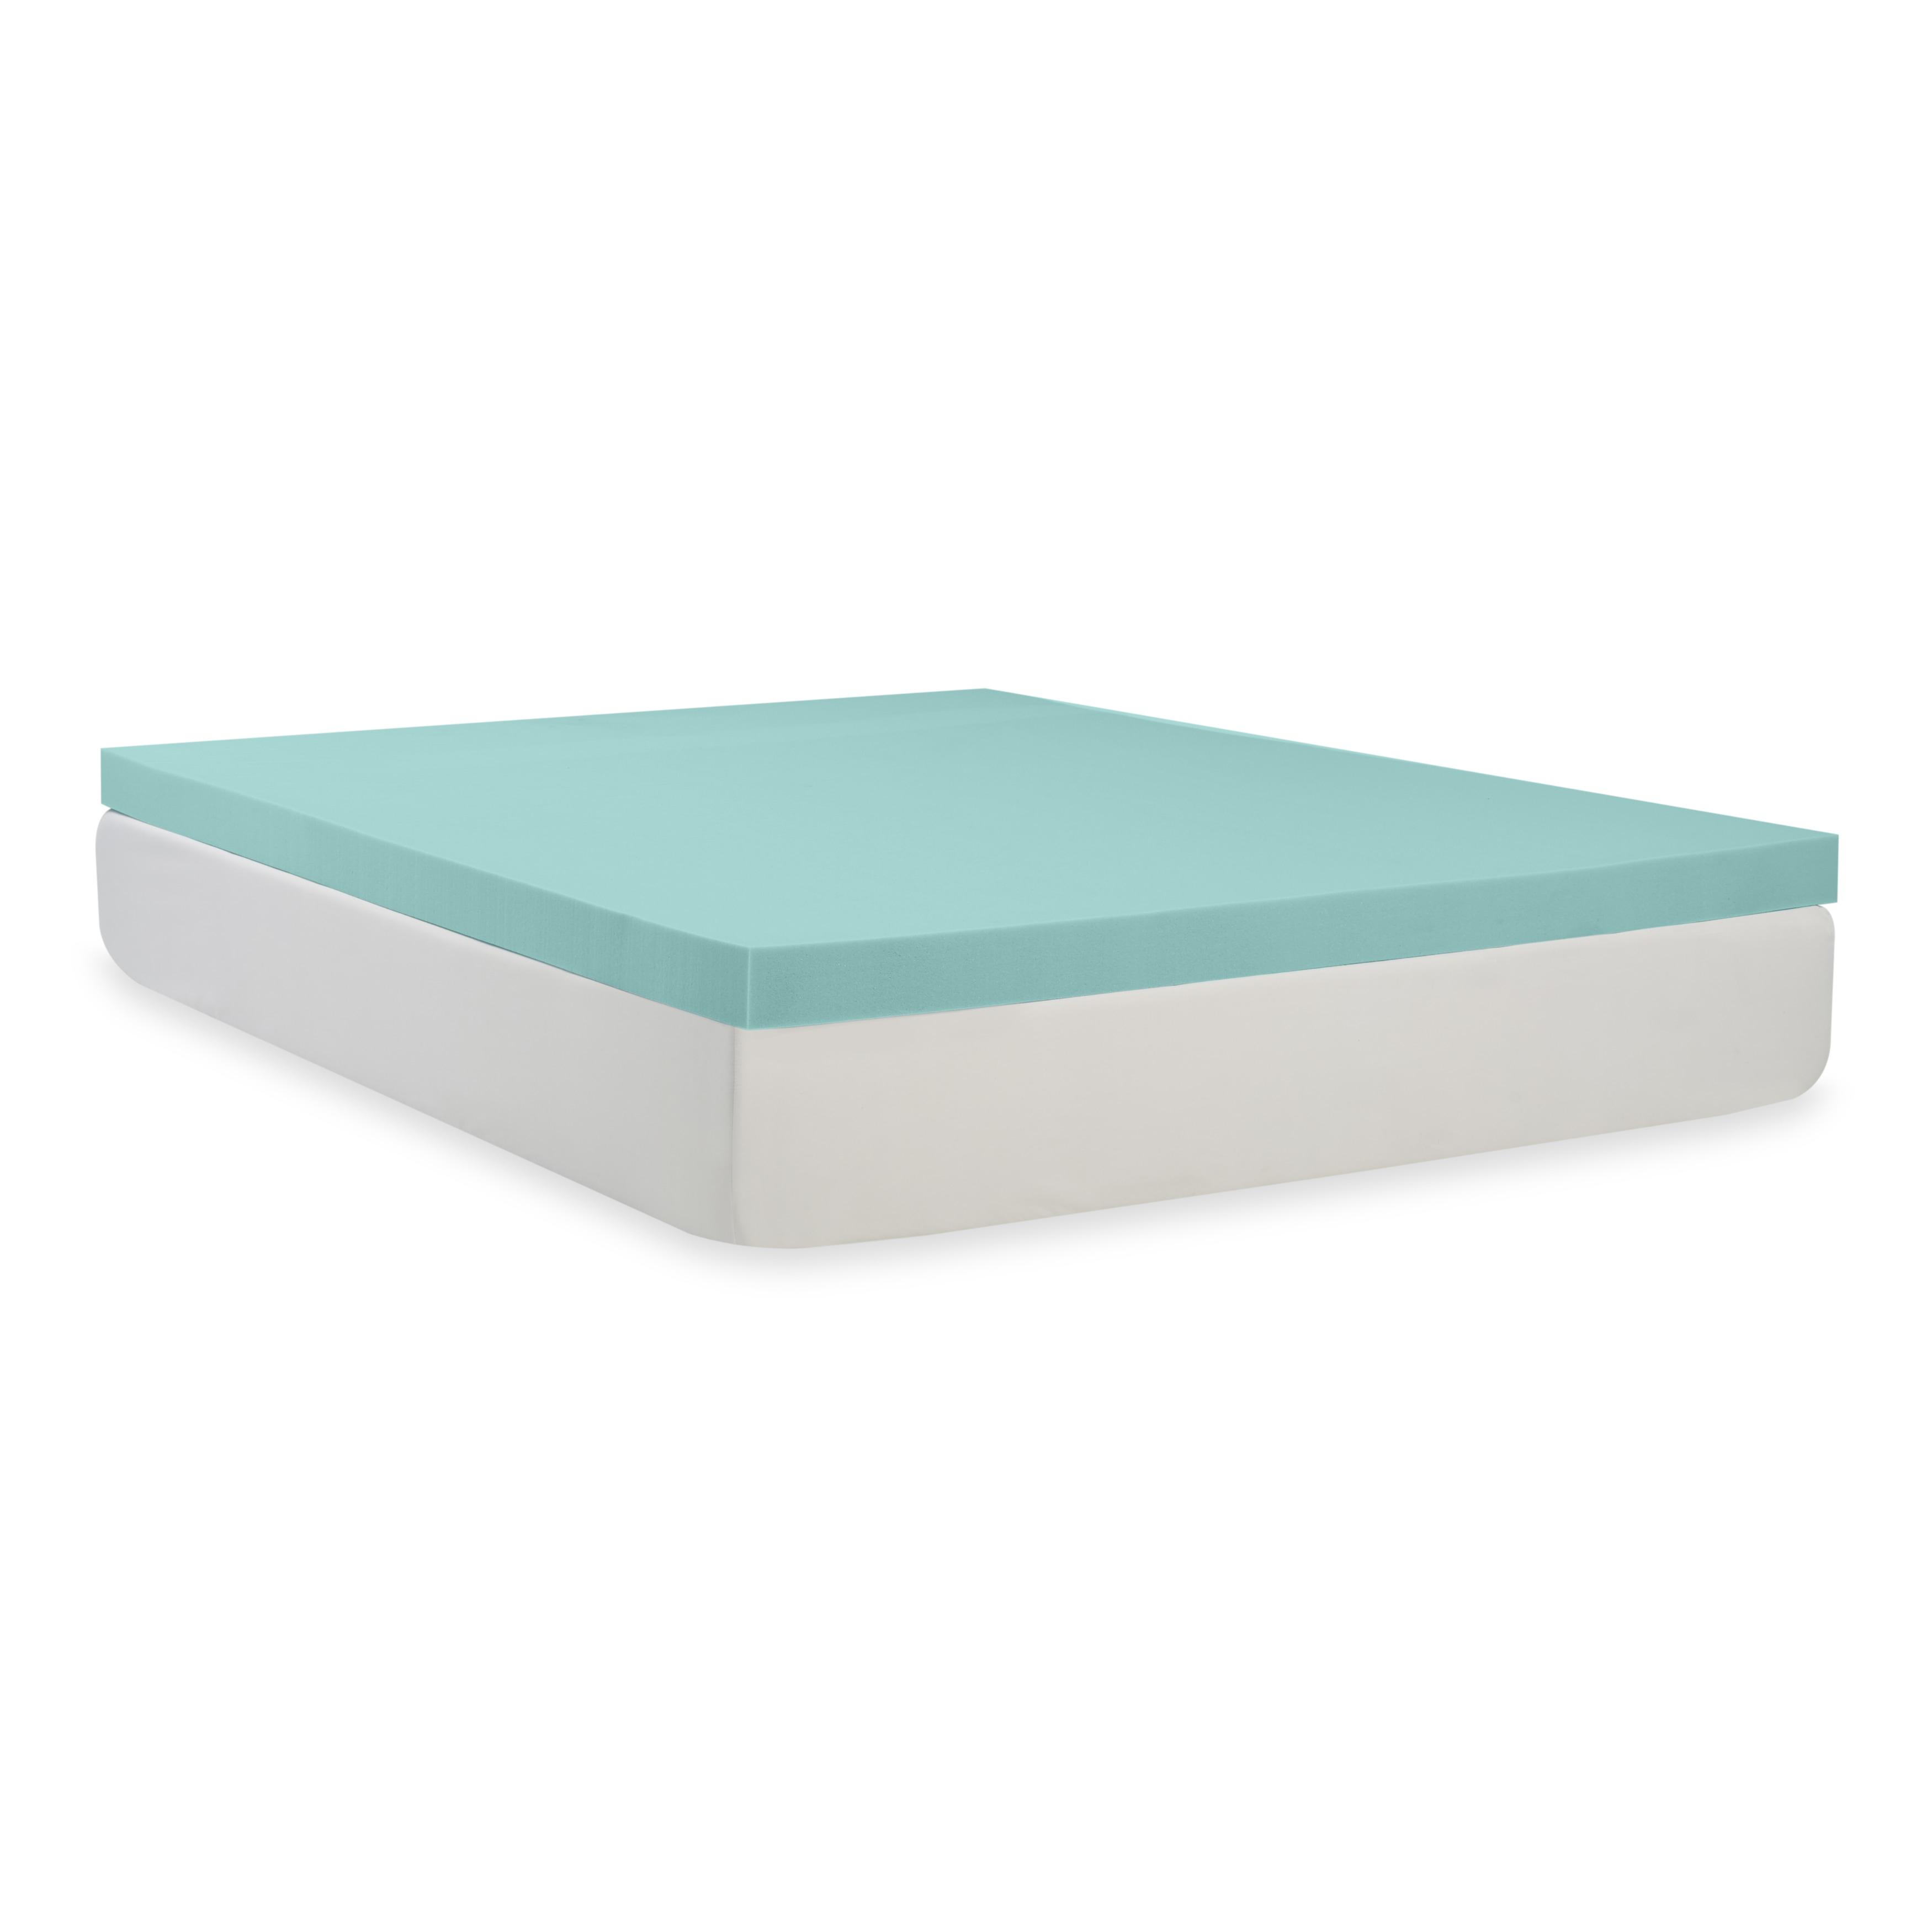 Shop Comfort Dreams Mem Cool 3 Inch Memory Foam Mattress Topper